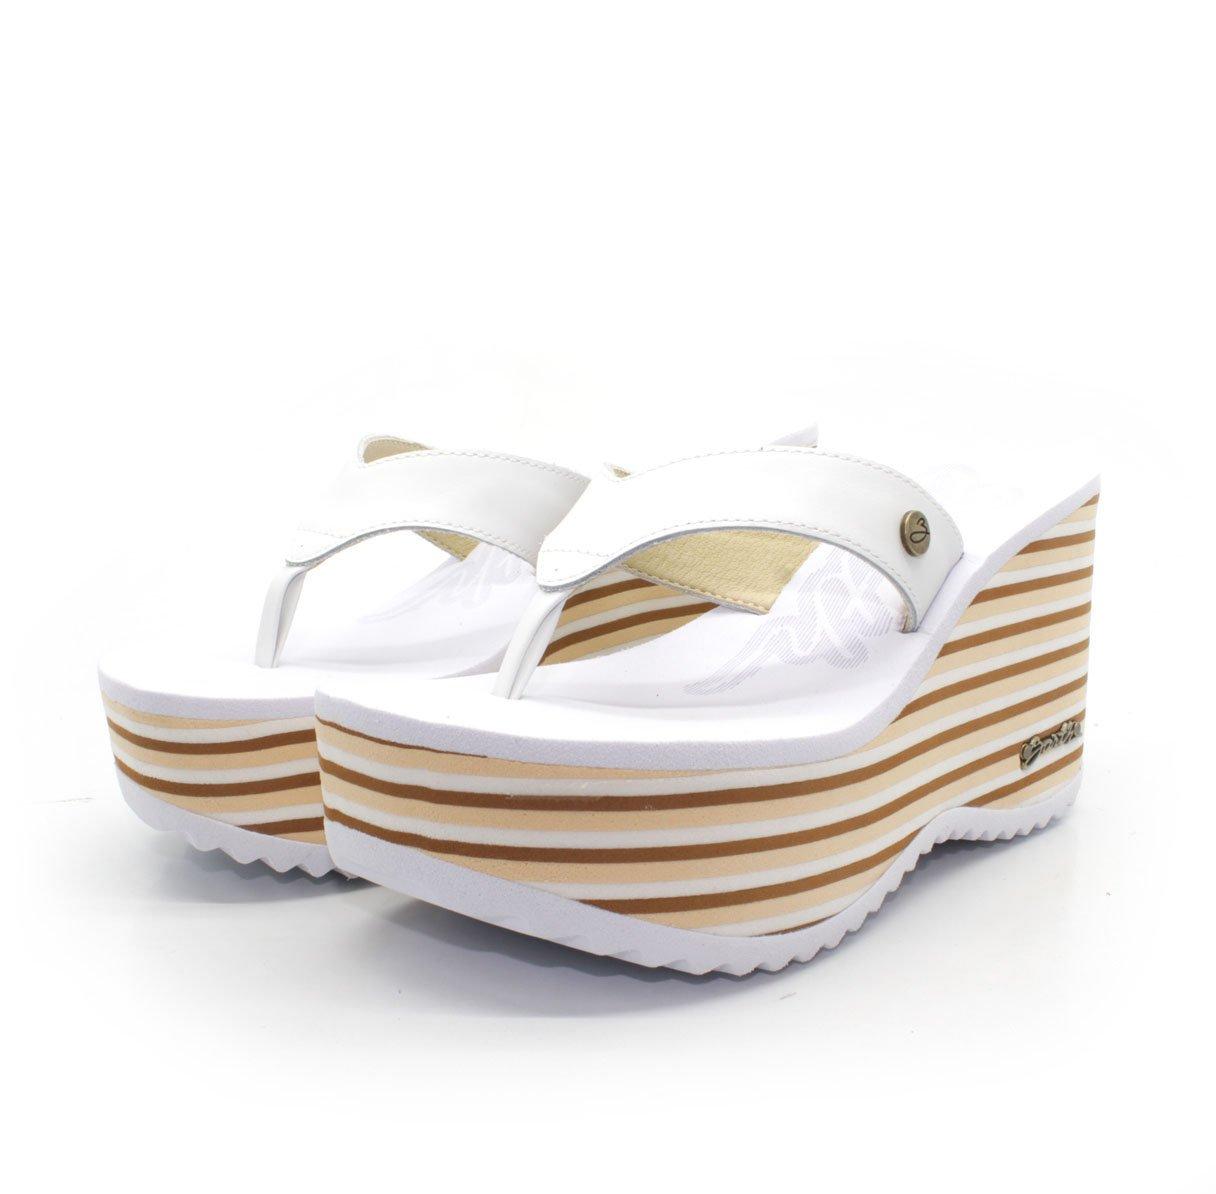 Sola Active Soles Lighweight Beach Shoes Graphite Lime